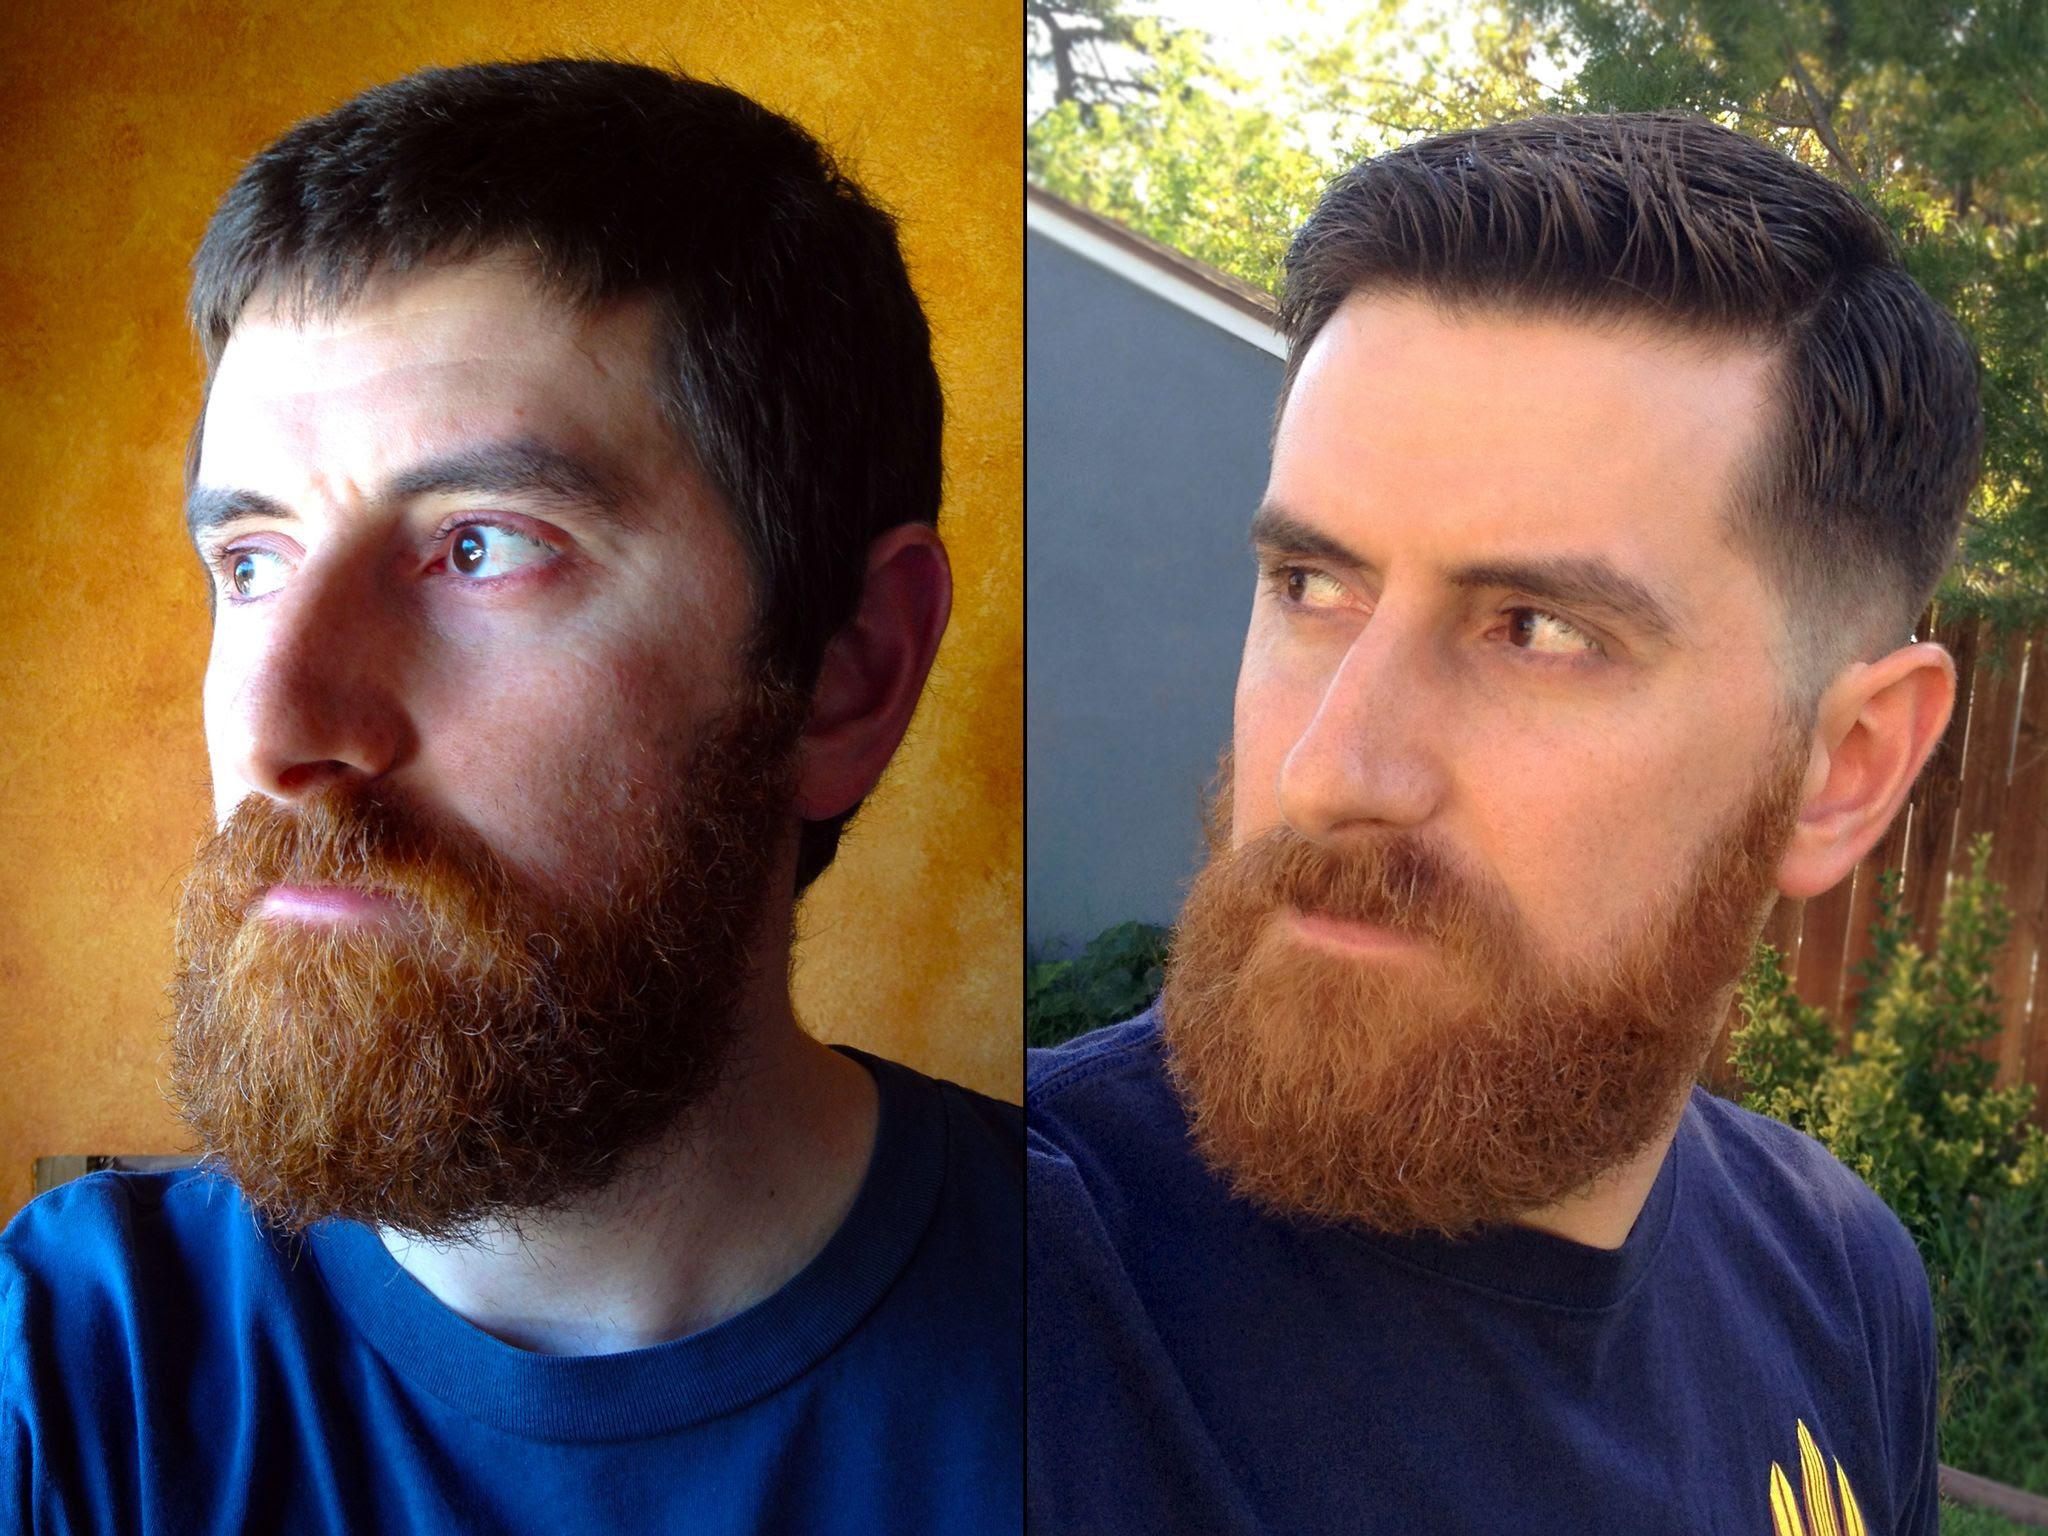 Cool Hairstyle 2014 Dapper Haircut With Beard